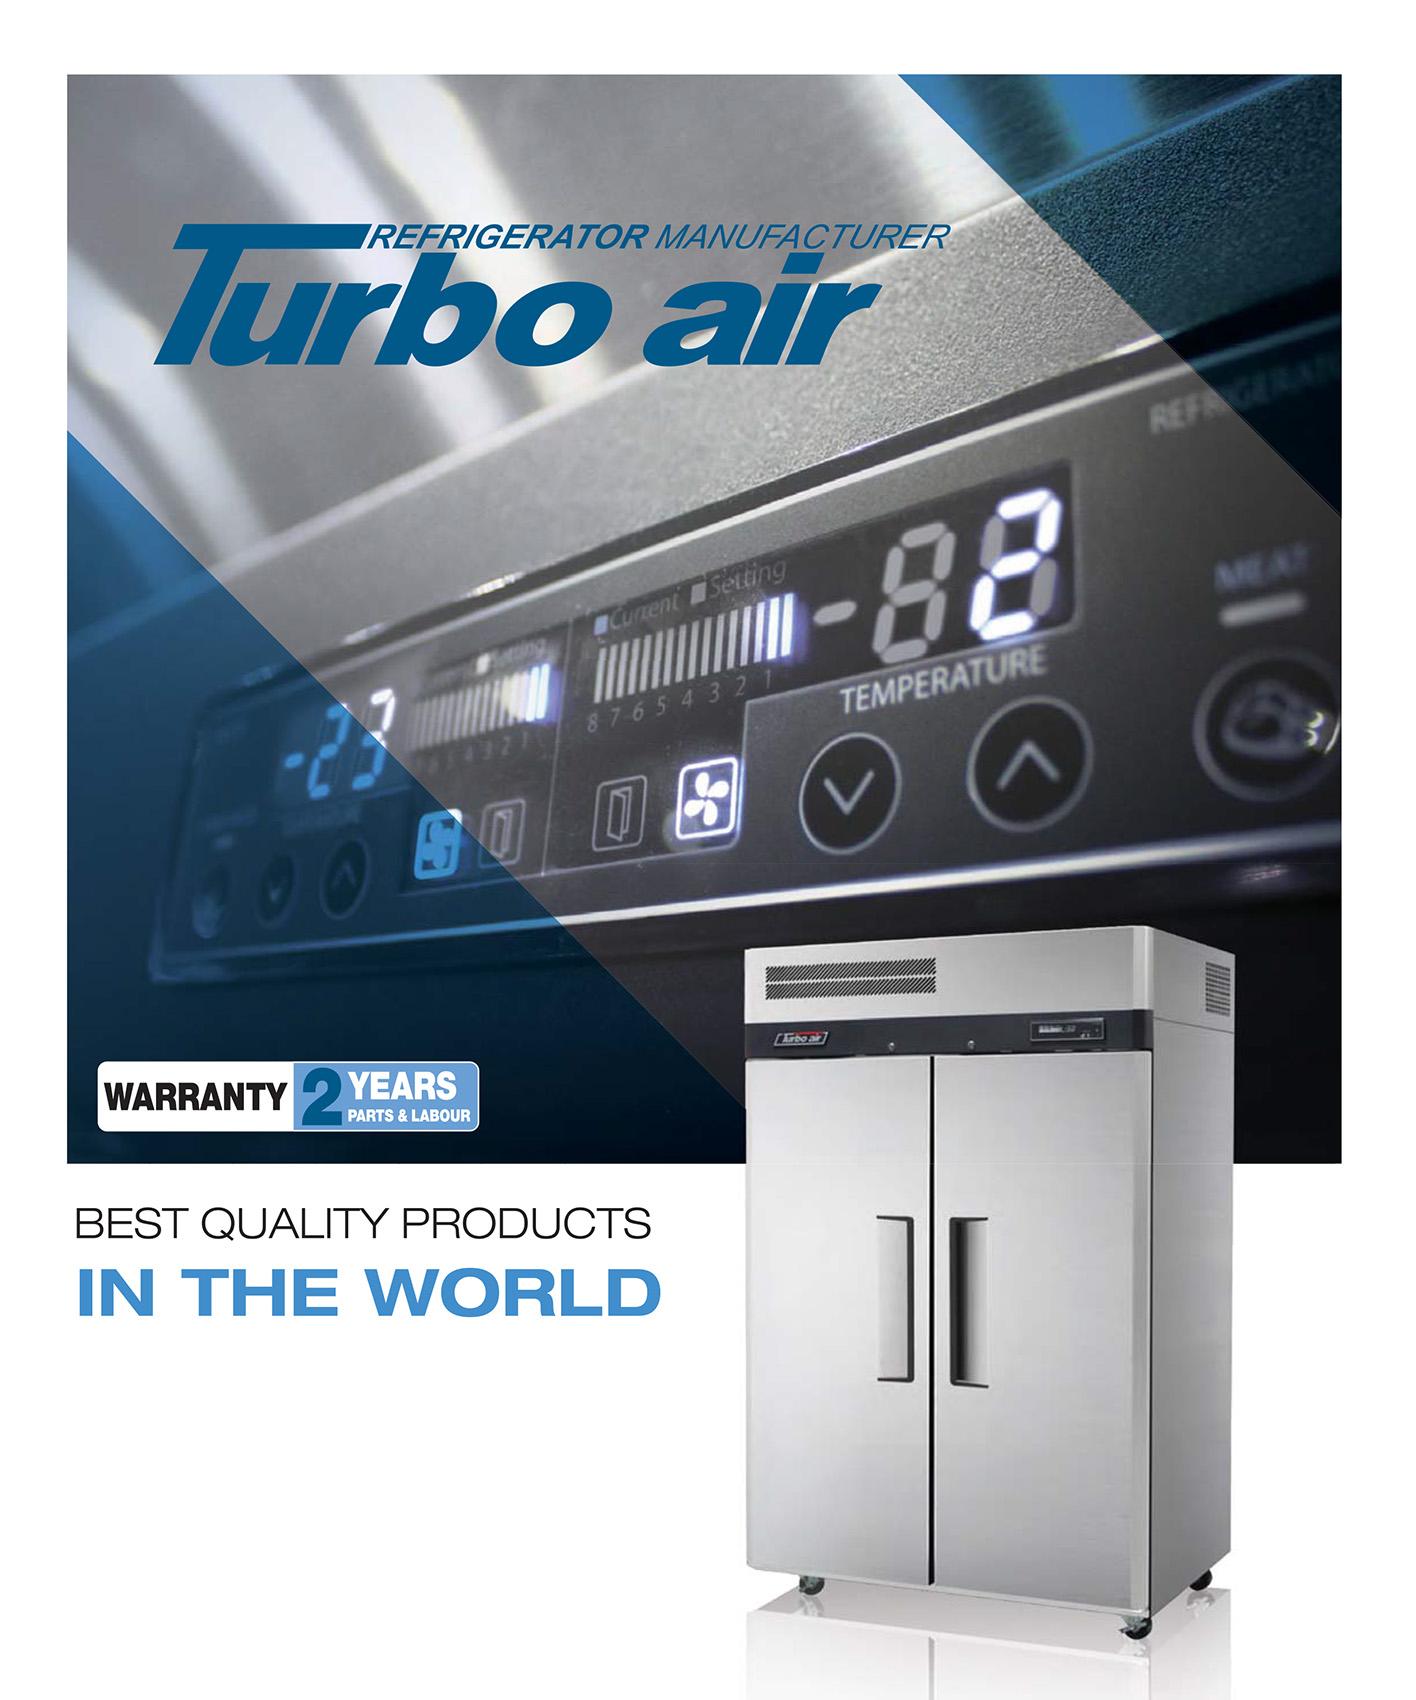 turbo-air-refrigeration-image.jpg